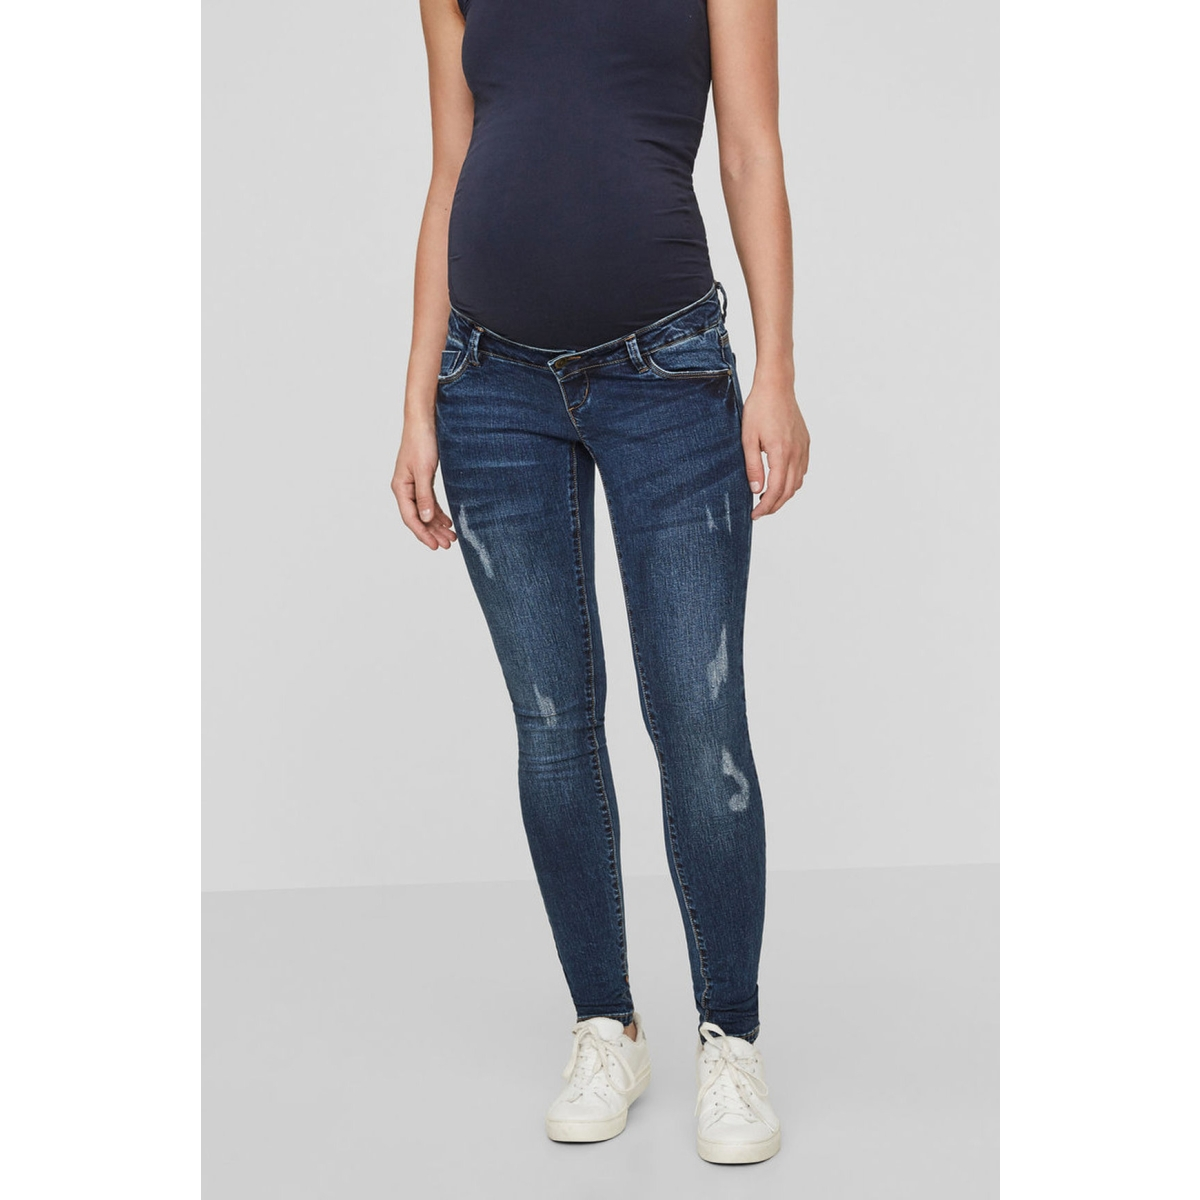 mlaugusta slim scratch jeans b. 20008067 mama-licious positie broek medium blue denim